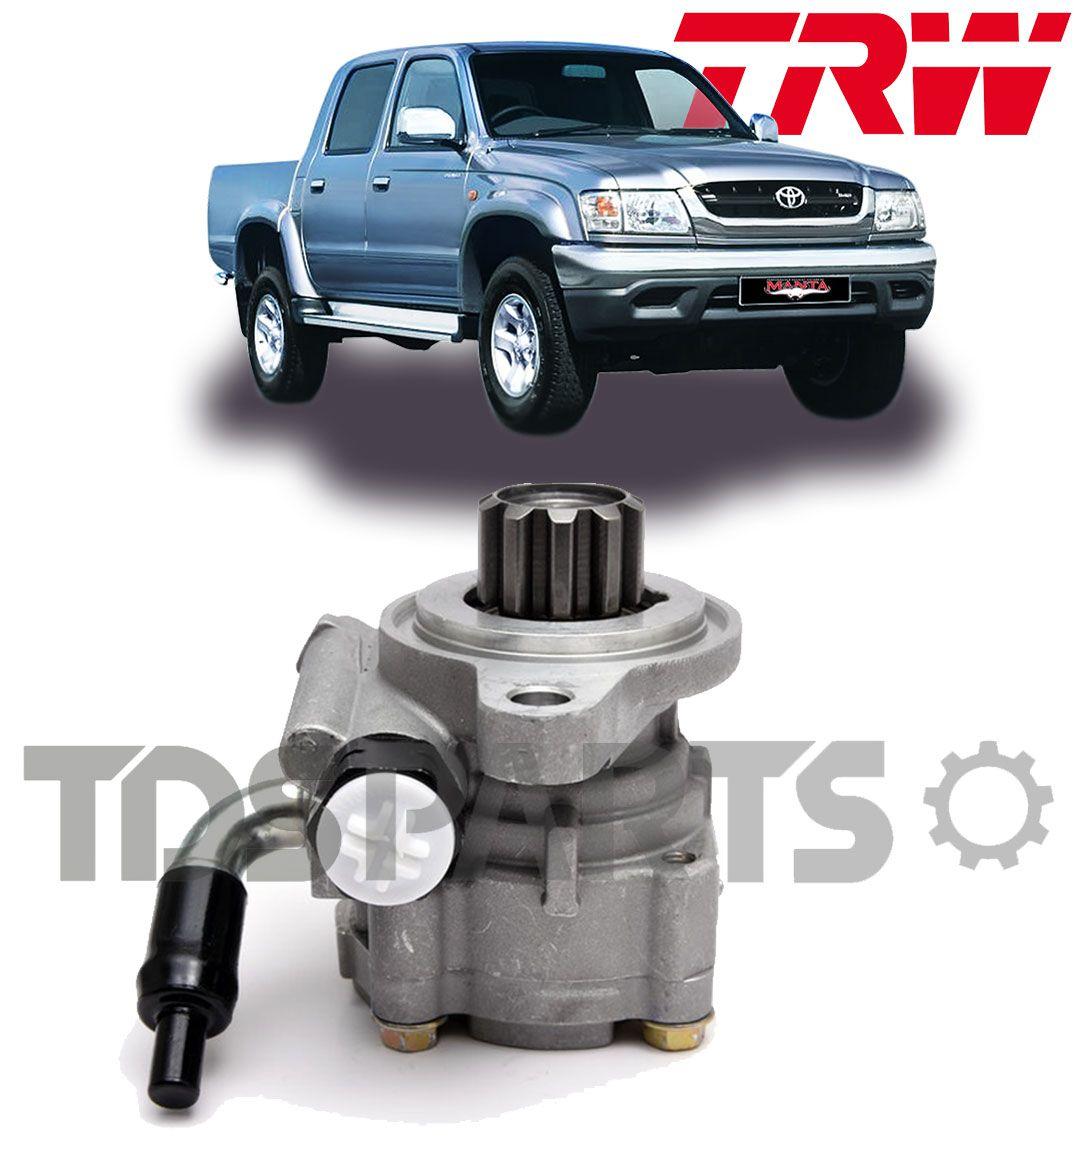 Bomba de Direção Hidráulica TRW Toyota Hilux 3.0 | SW4 - Aspirada